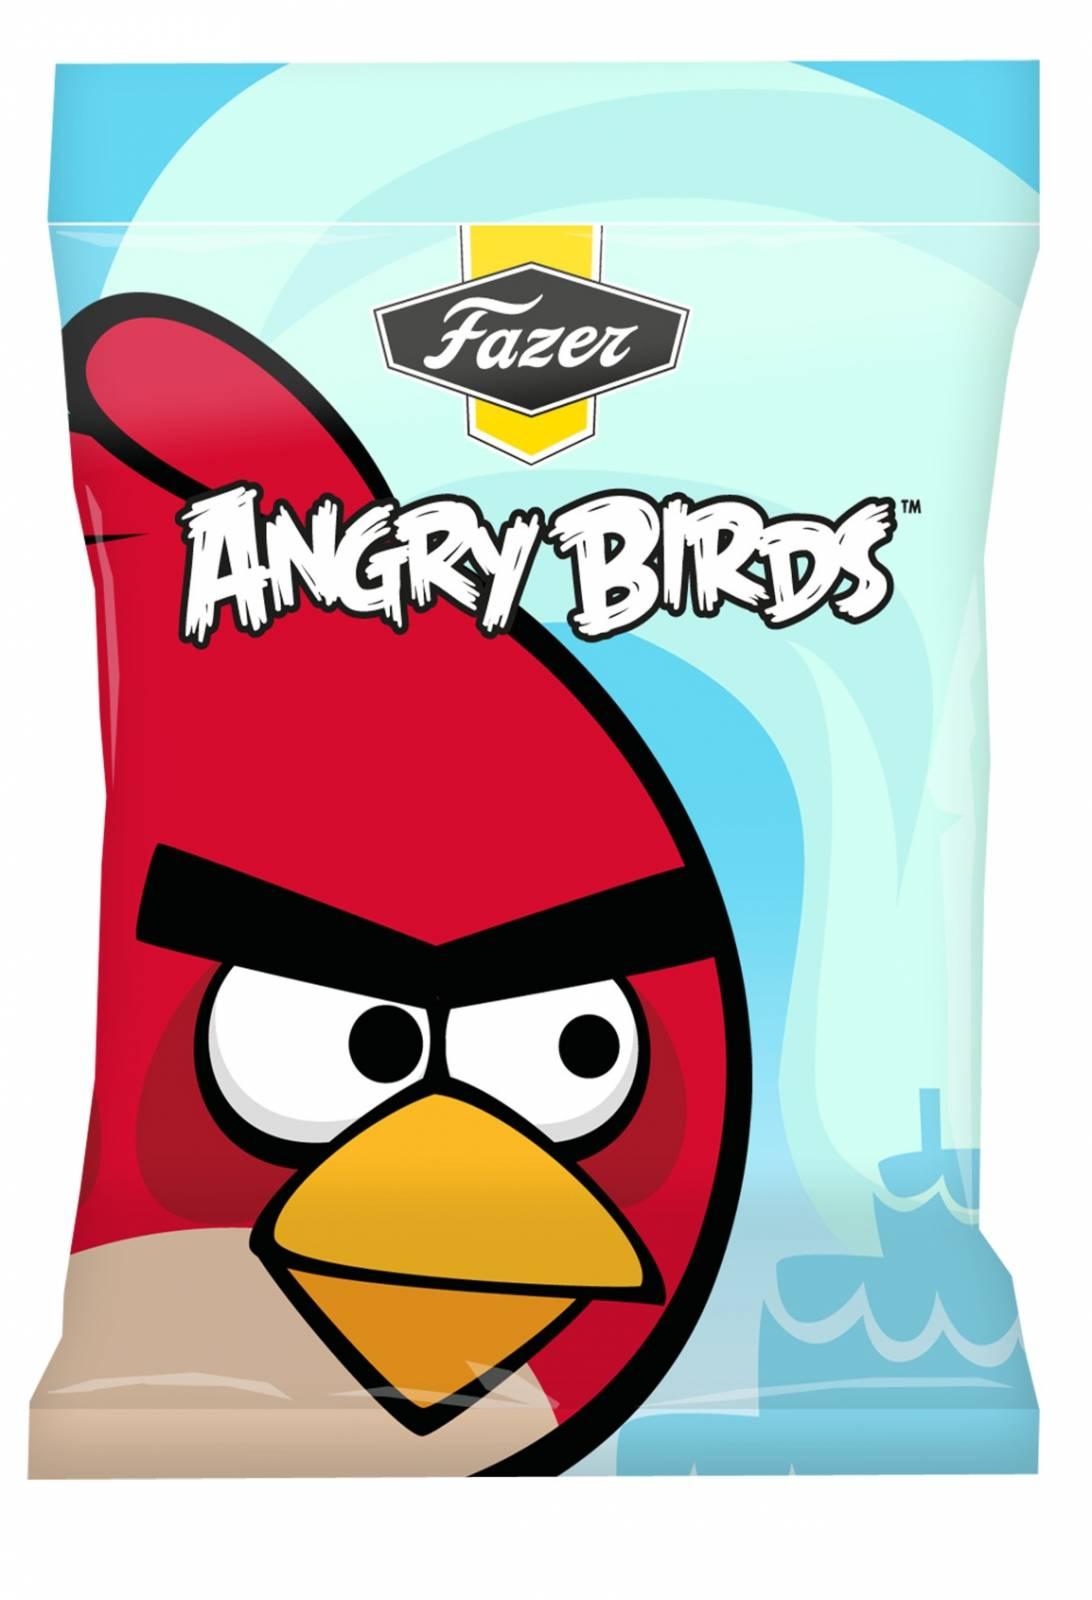 Angry Birds samarbejder med Fazer